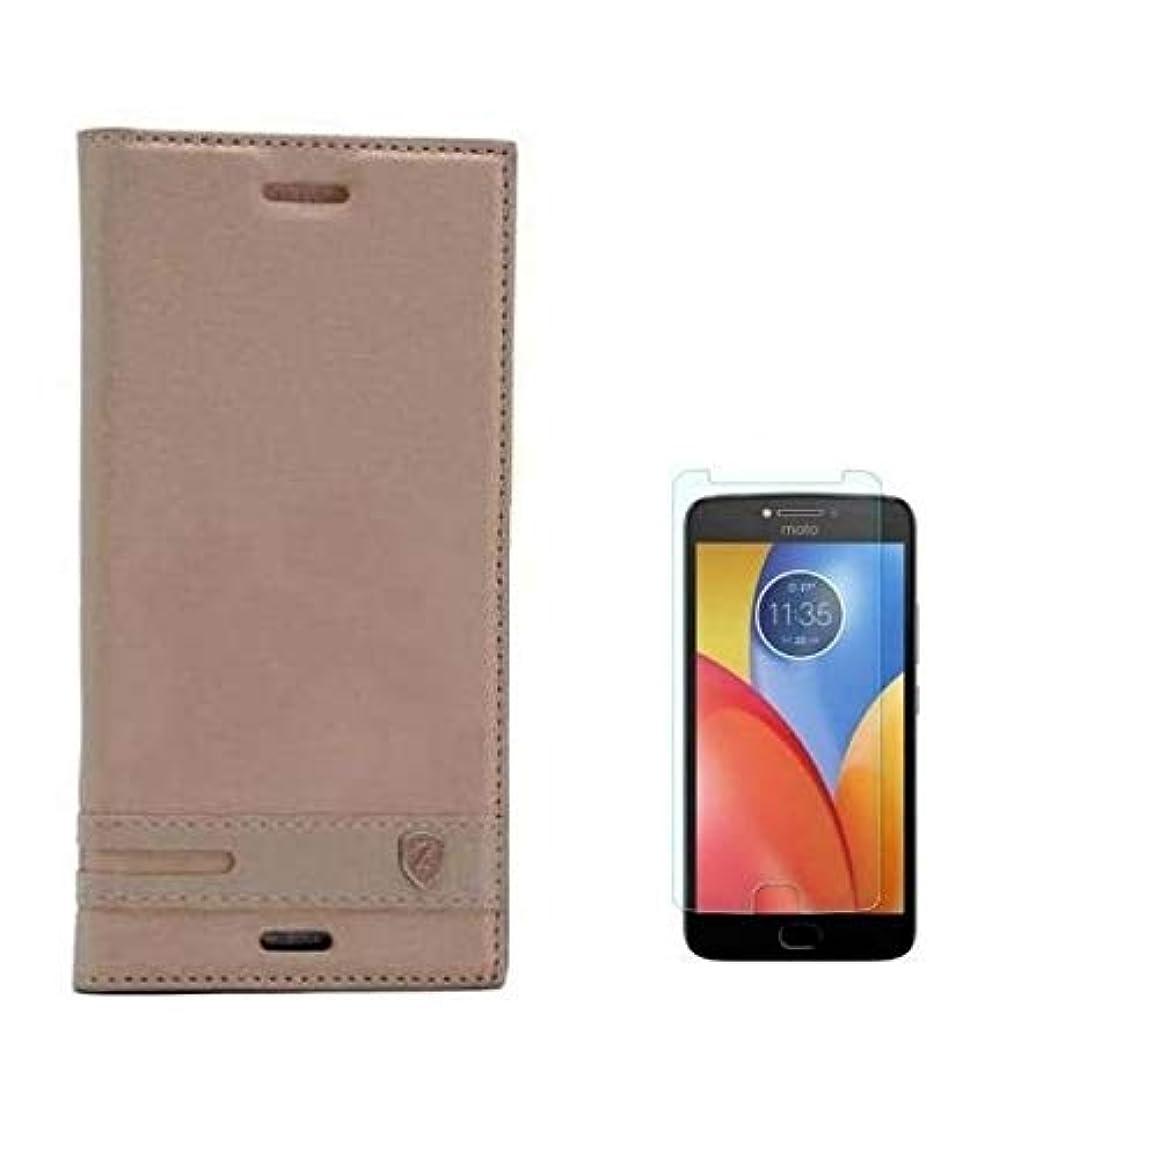 Teleplus for Motorola Moto E4 Magnet Full Protective Cover Case Gold + Glass Screen Protector